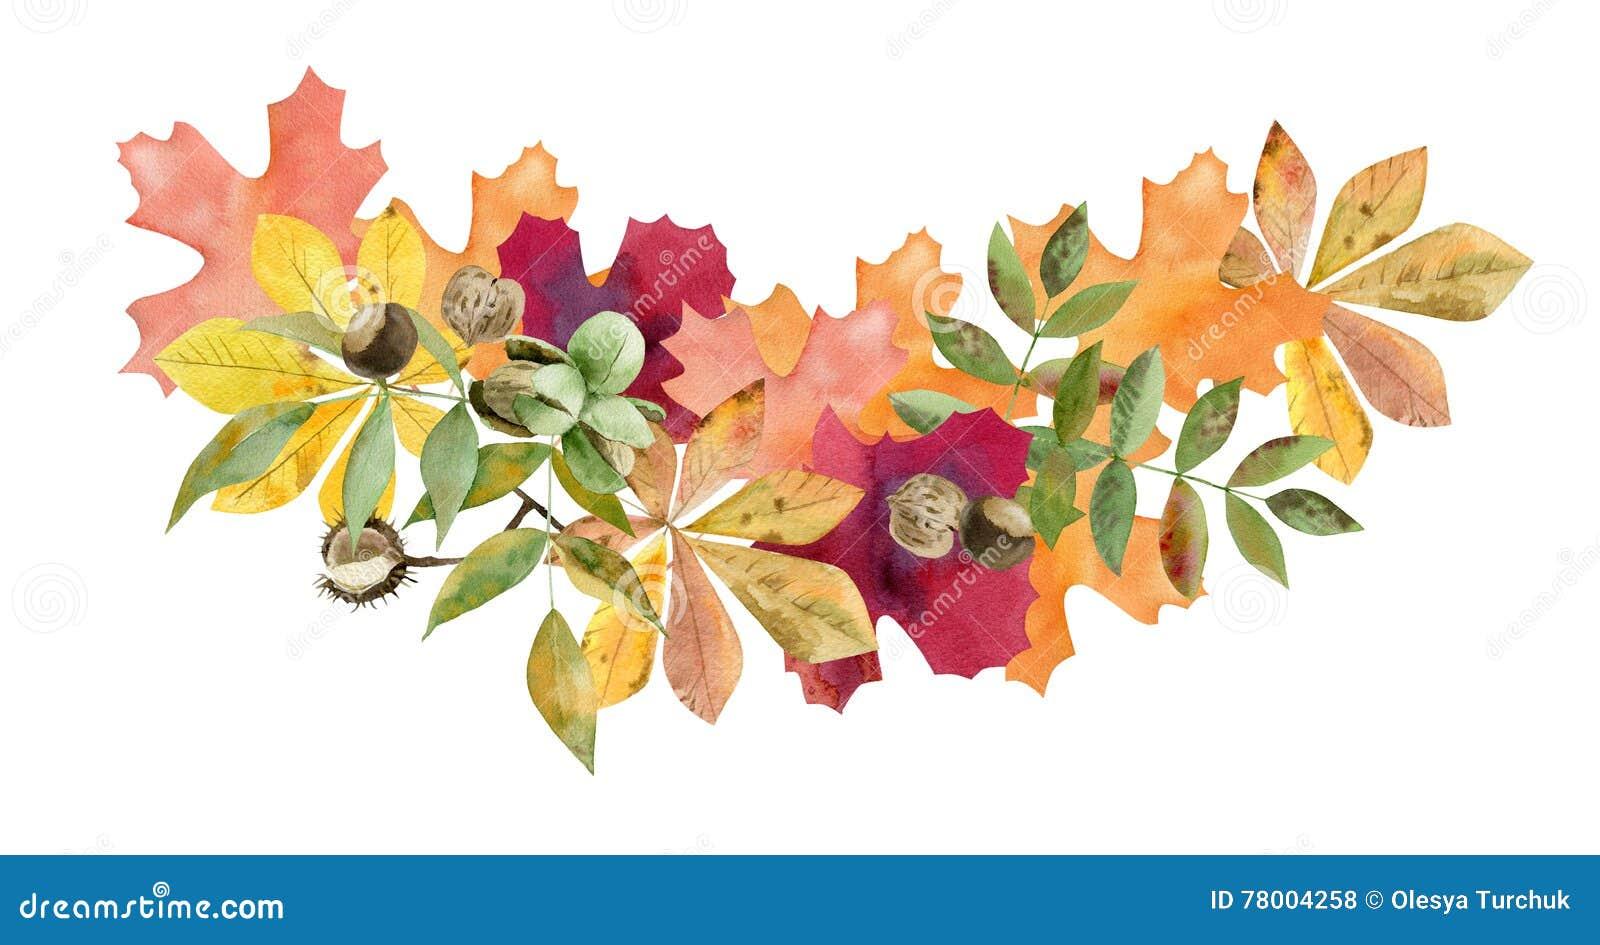 Clip Art Autumn Foliage